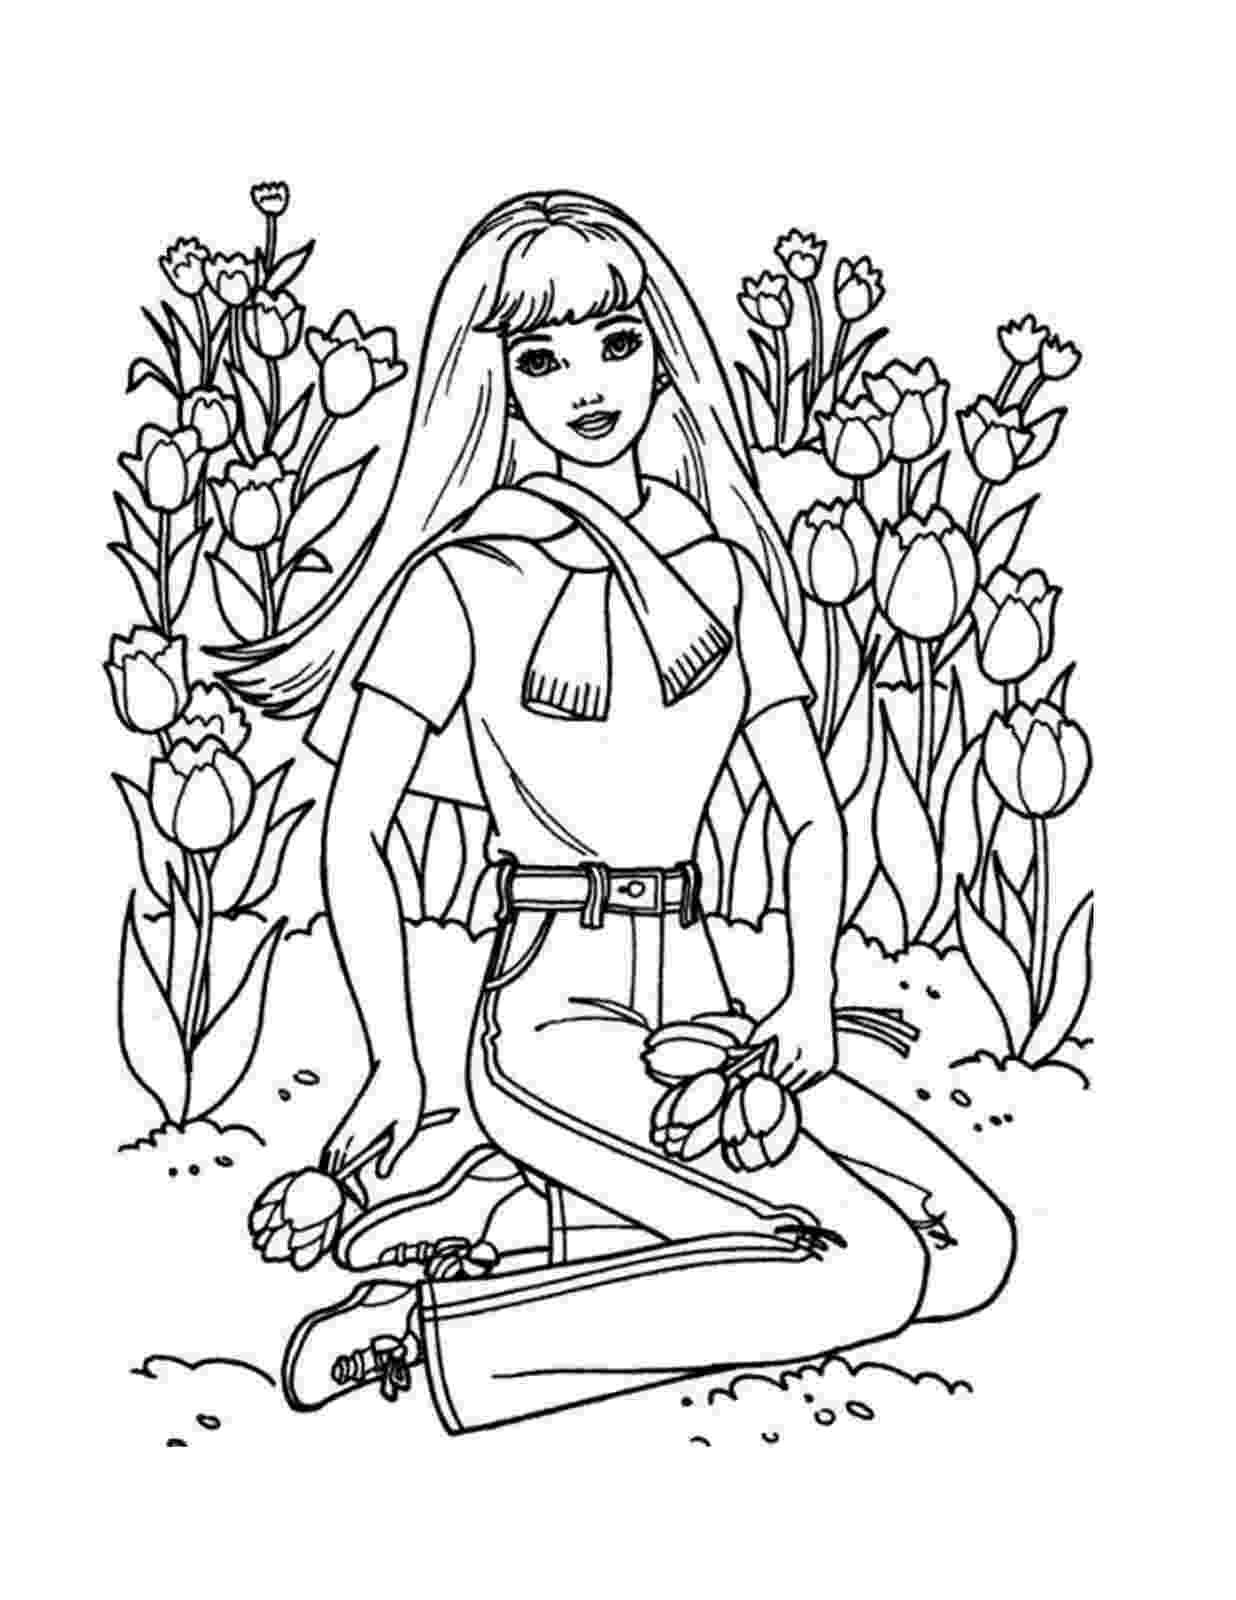 barbie princess coloring book barbie island princess coloring page woo jr kids princess book coloring barbie